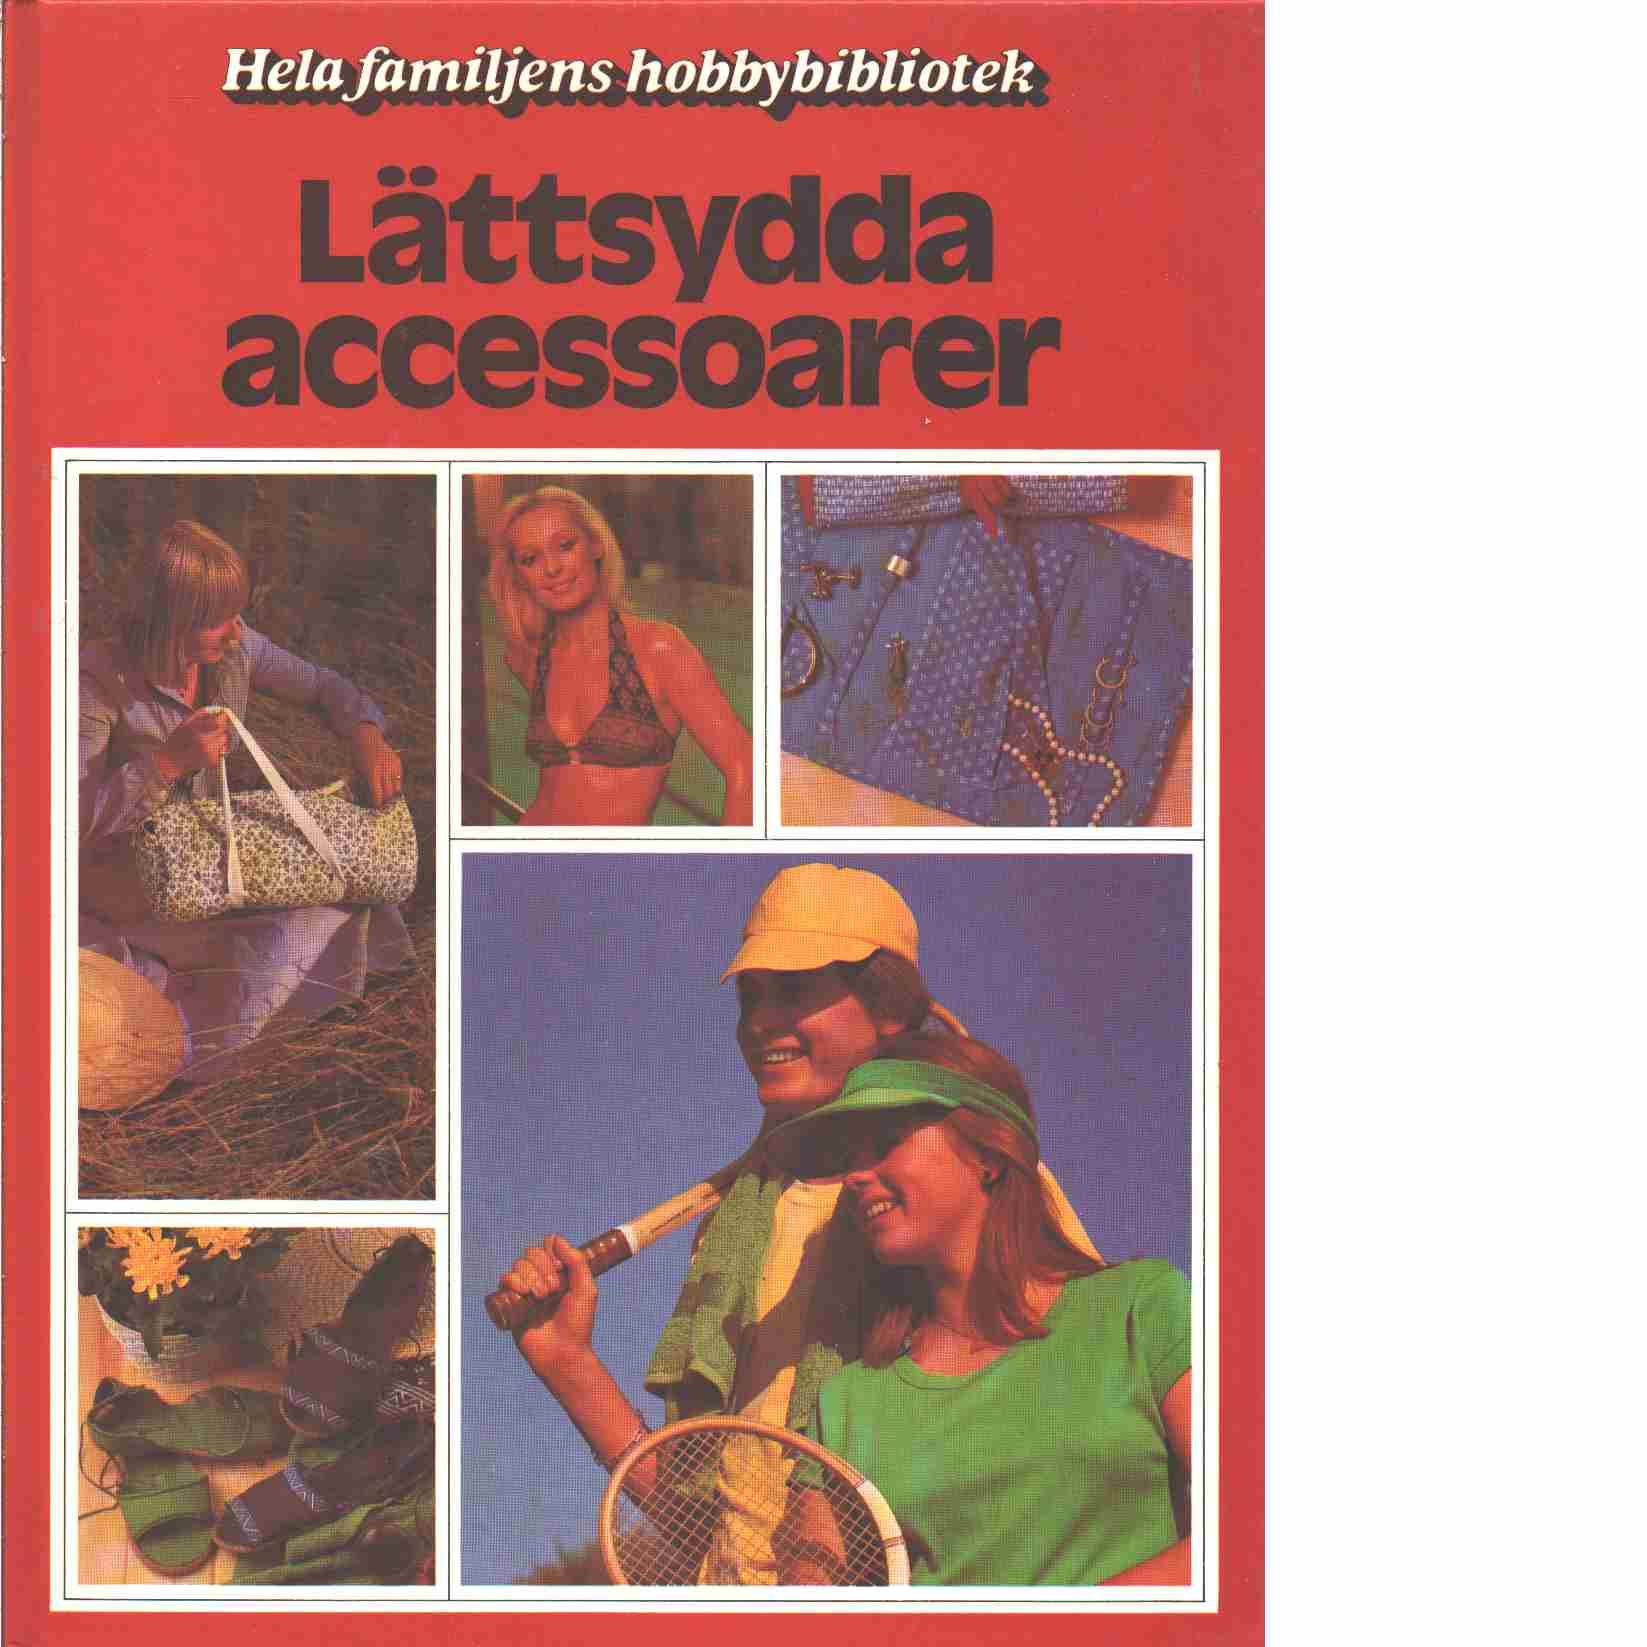 Lättsydda accessoarer - Red.Bruce, Pauline